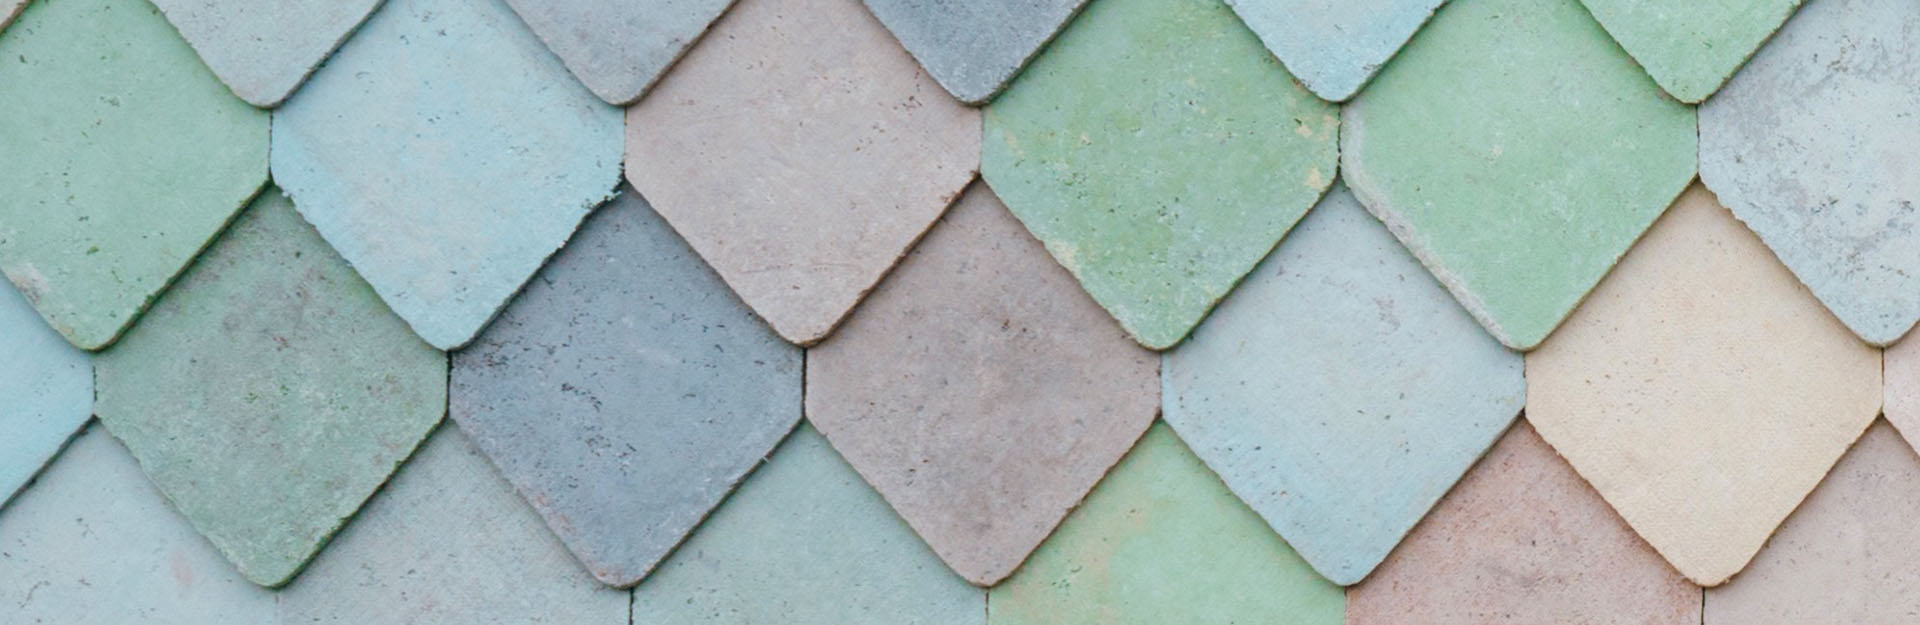 porcelain tiles roof tiles floor